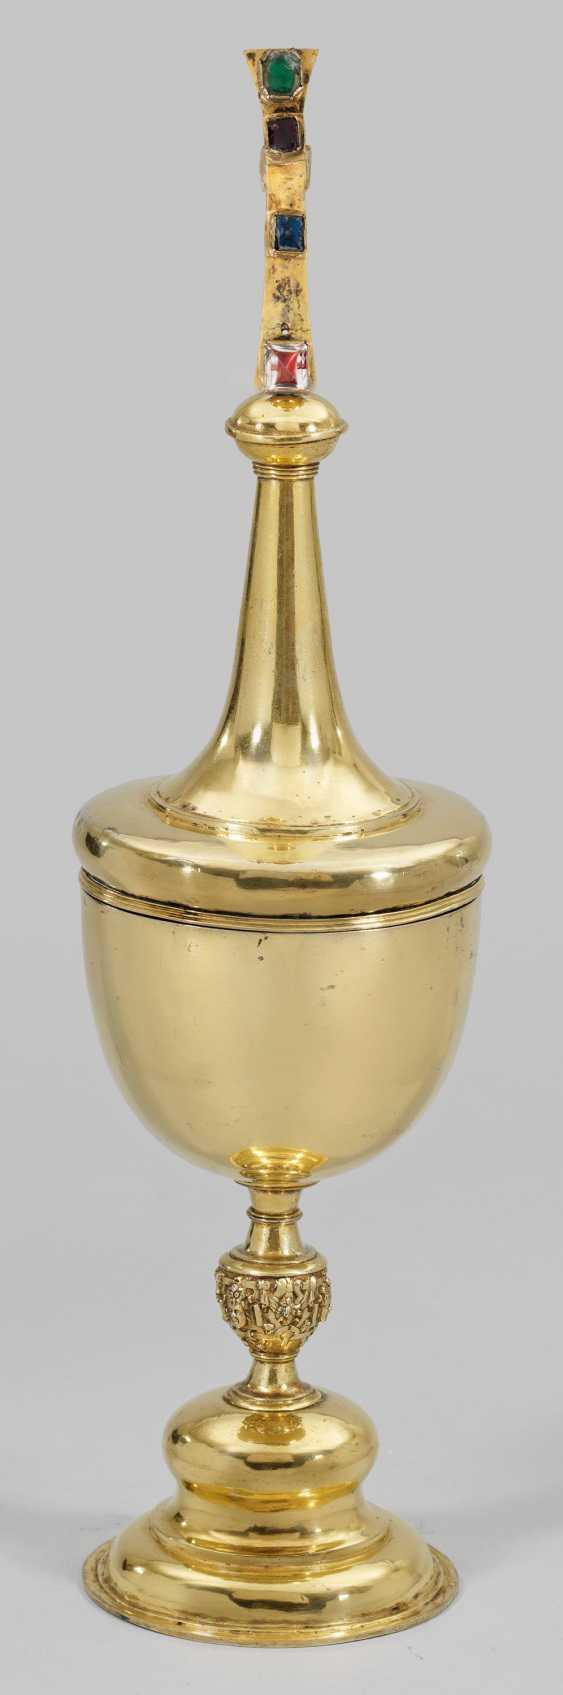 Communion Cup - photo 1